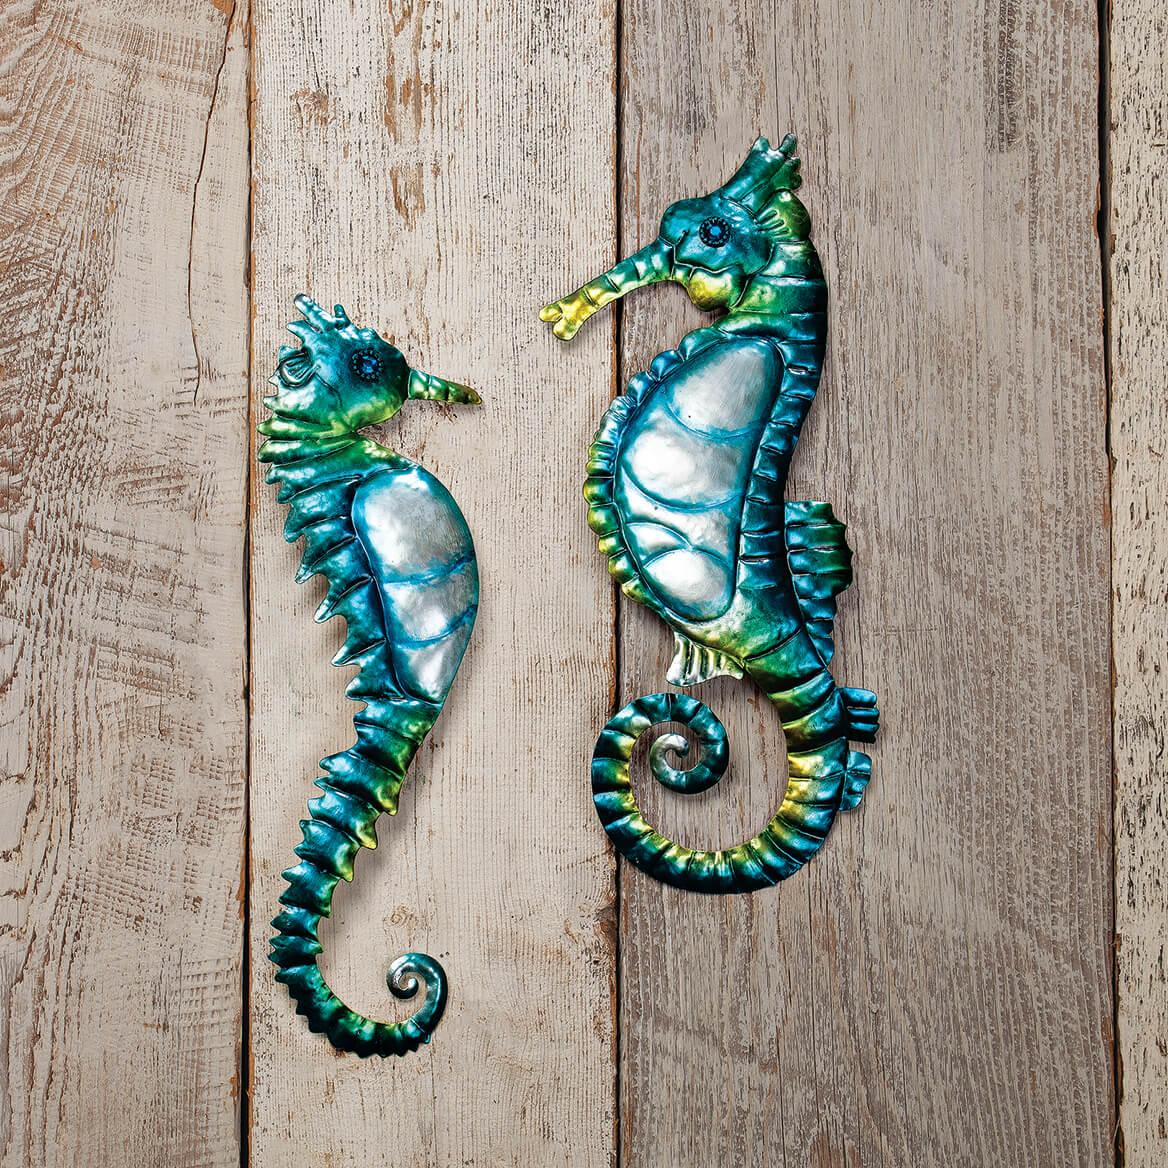 Seahorse Metal Hangings, Set of 2 by Fox River™ Creations-371215